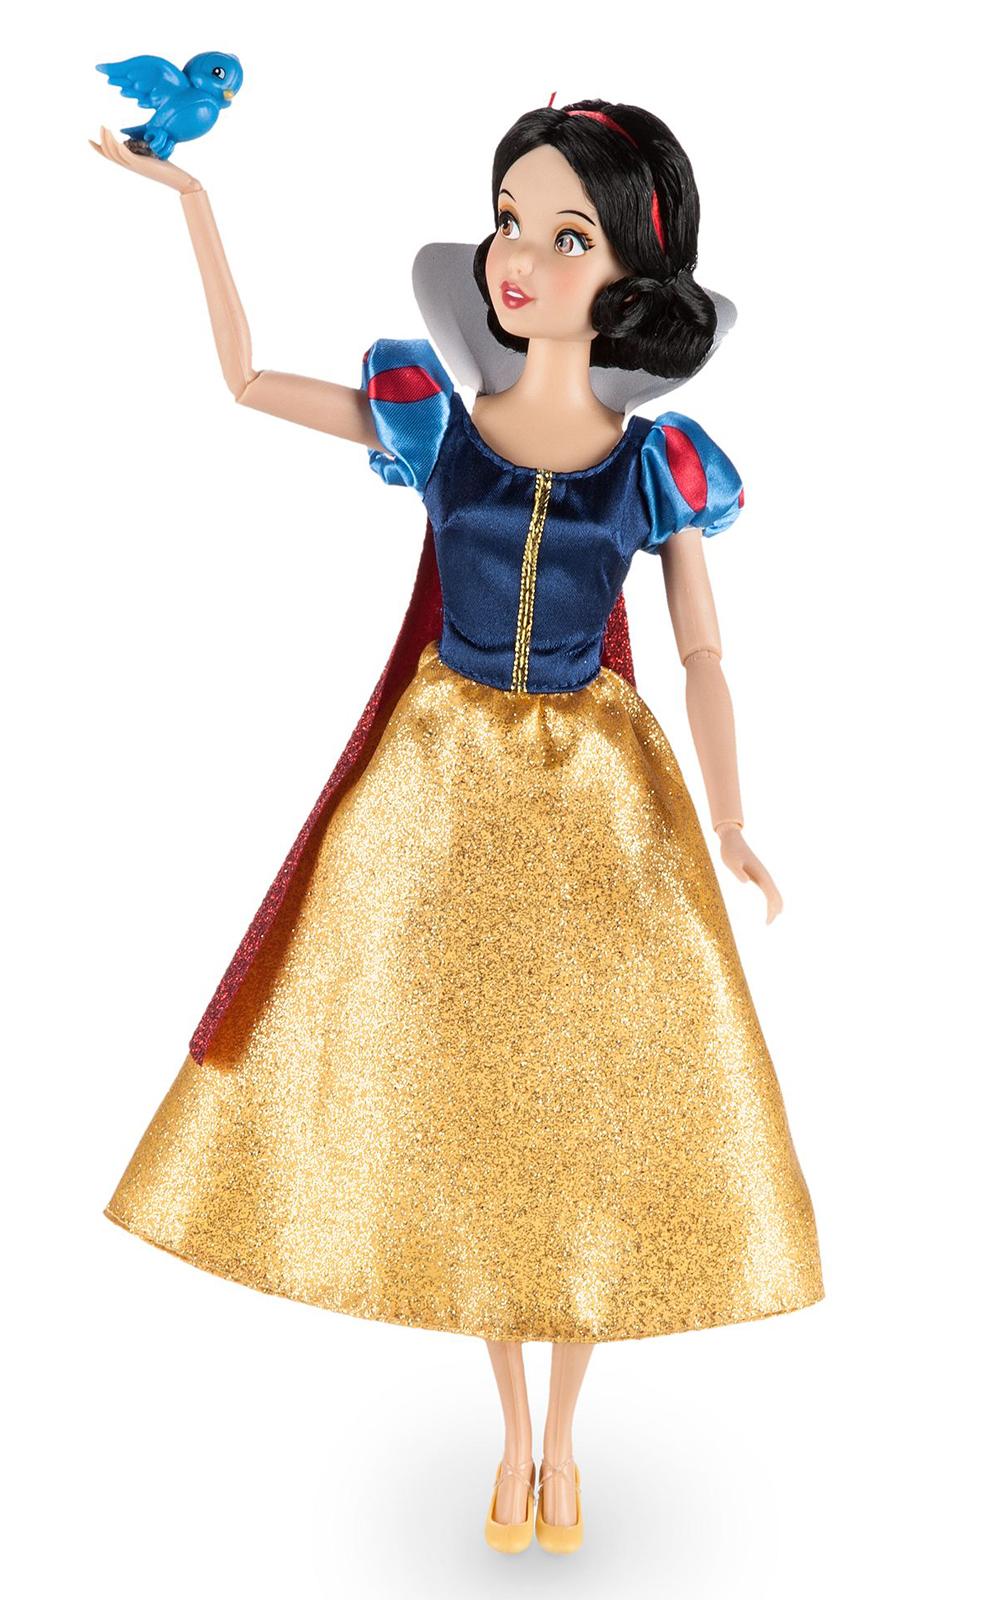 b045f06cc5 Filmic Light - Snow White Archive  2016-17 Disney Store